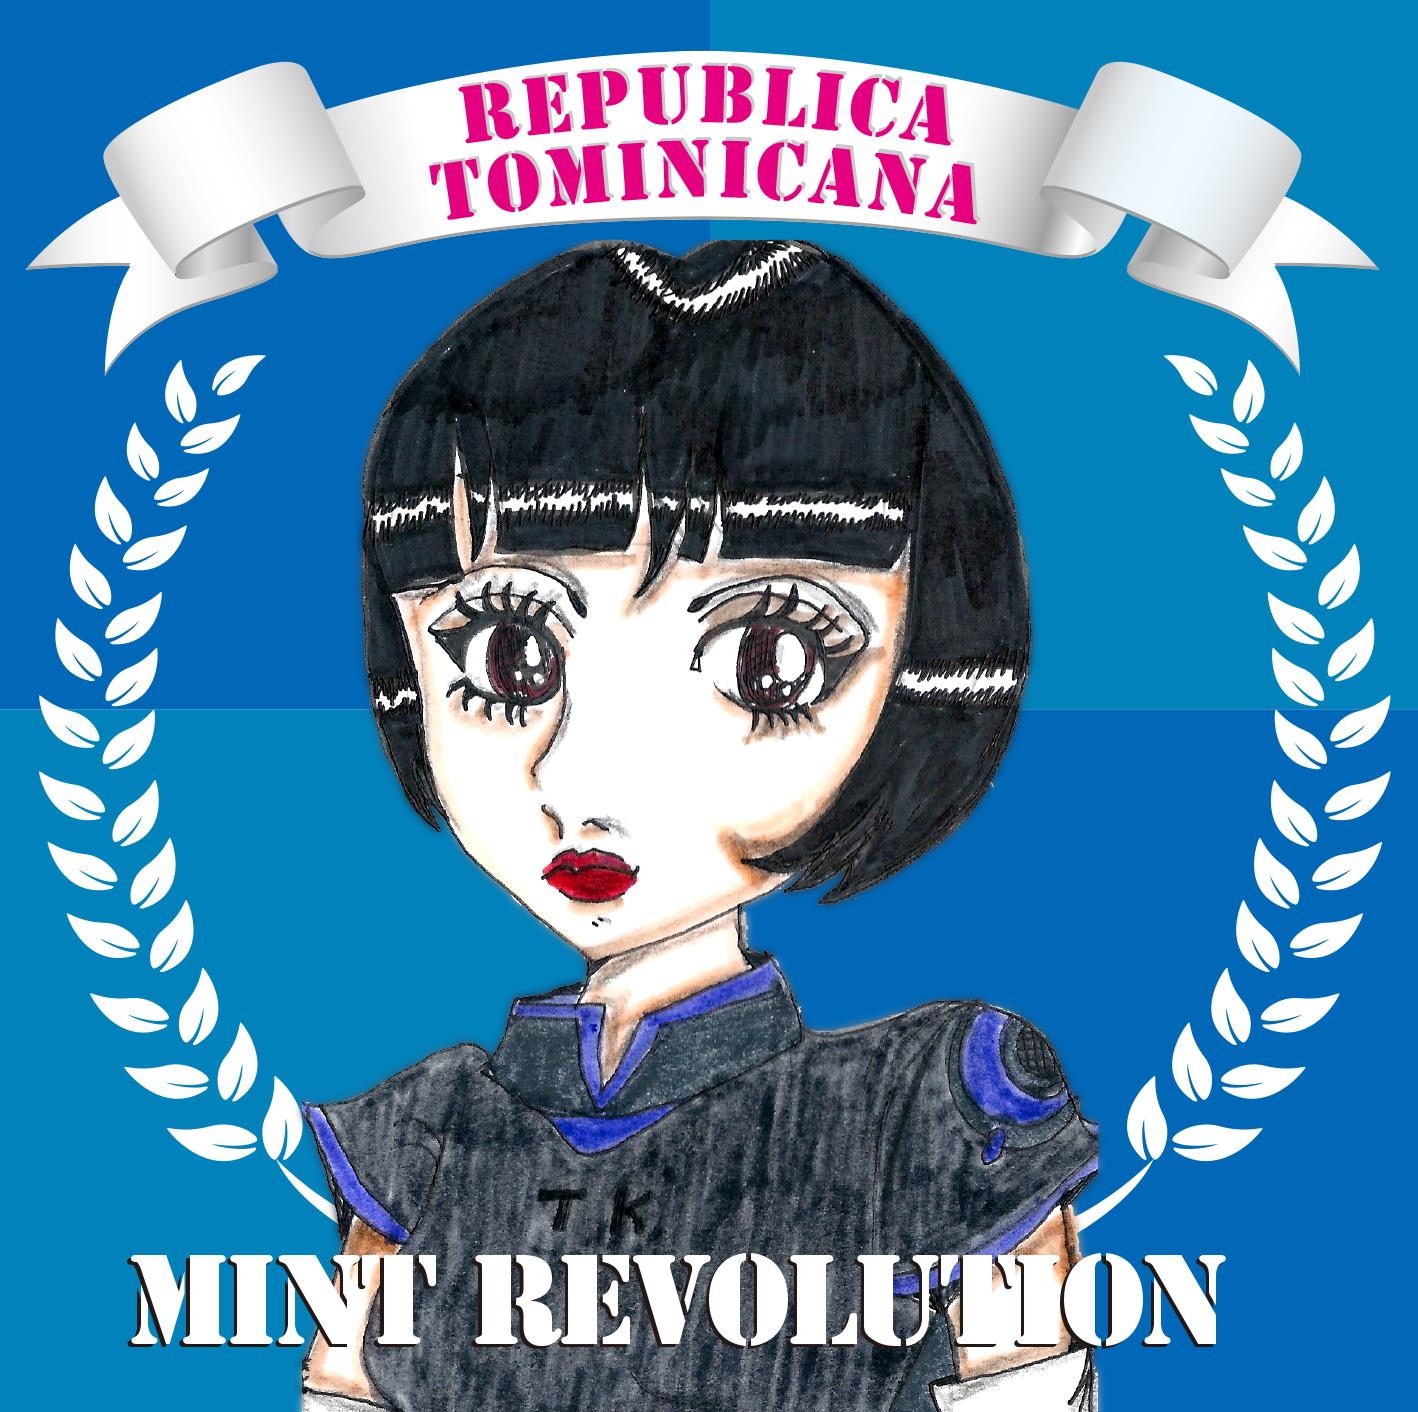 MINT REVOLUTION